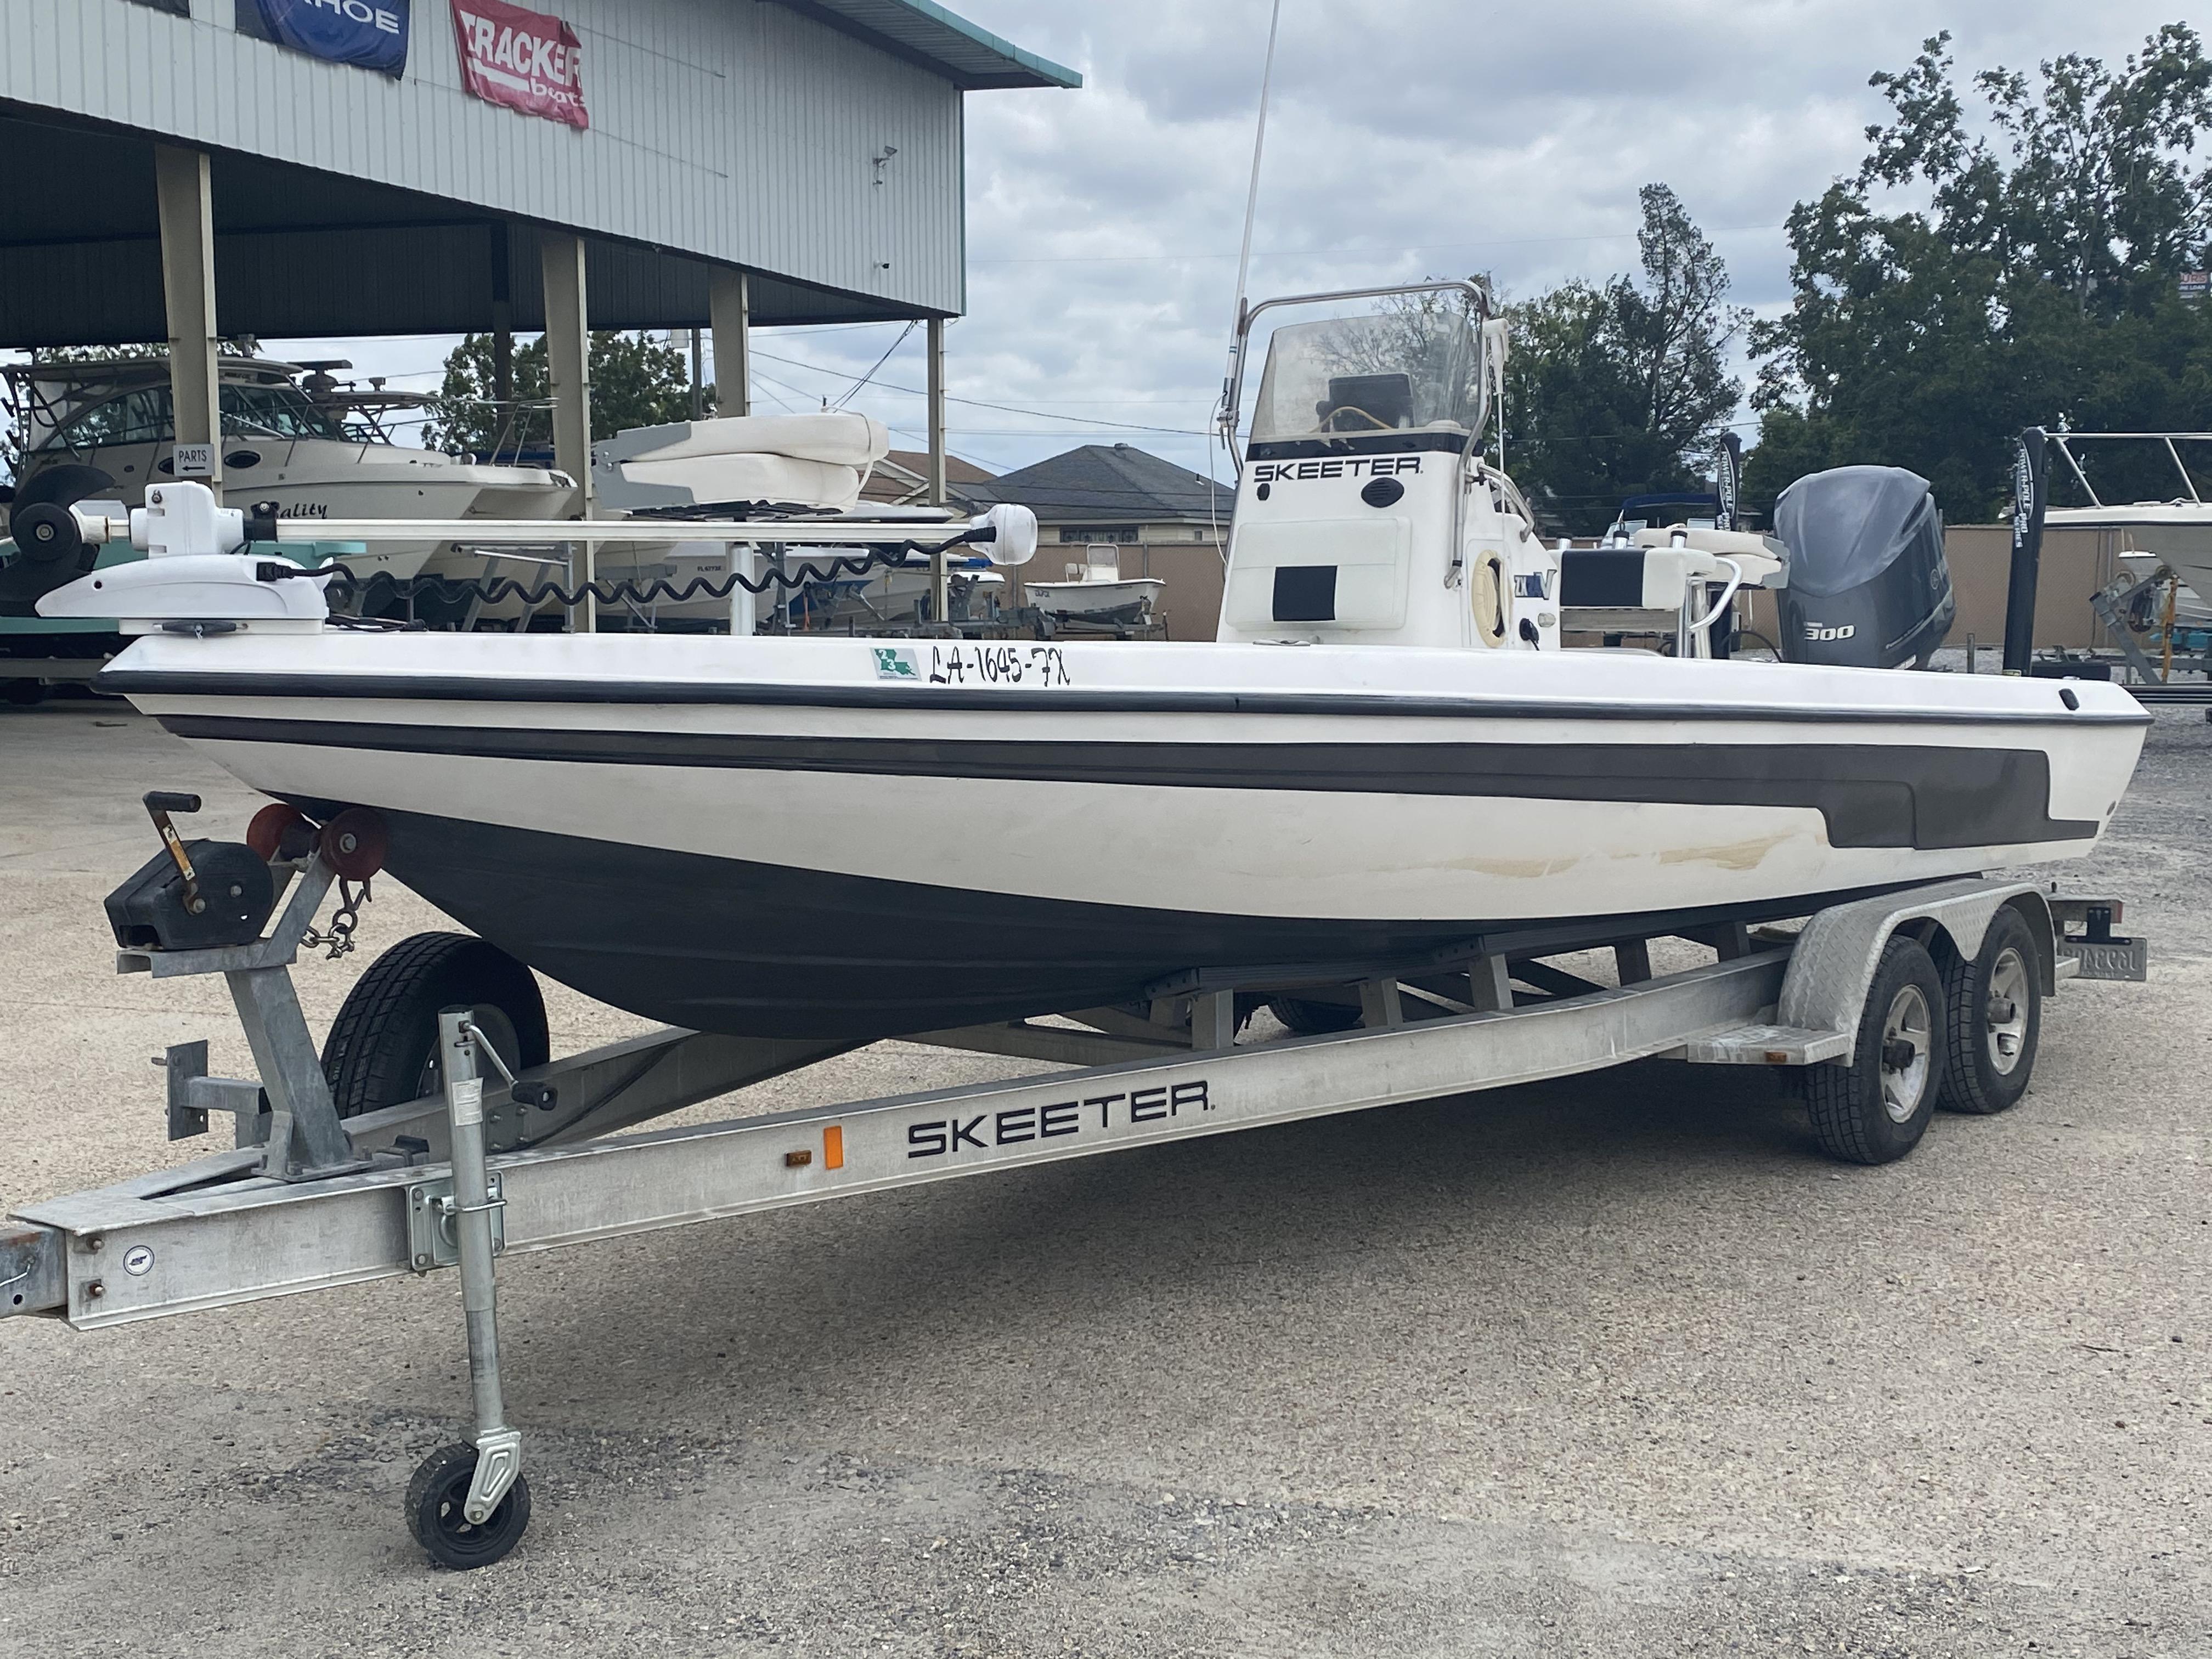 2010 Skeeter boat for sale, model of the boat is ZX 24V & Image # 16 of 18